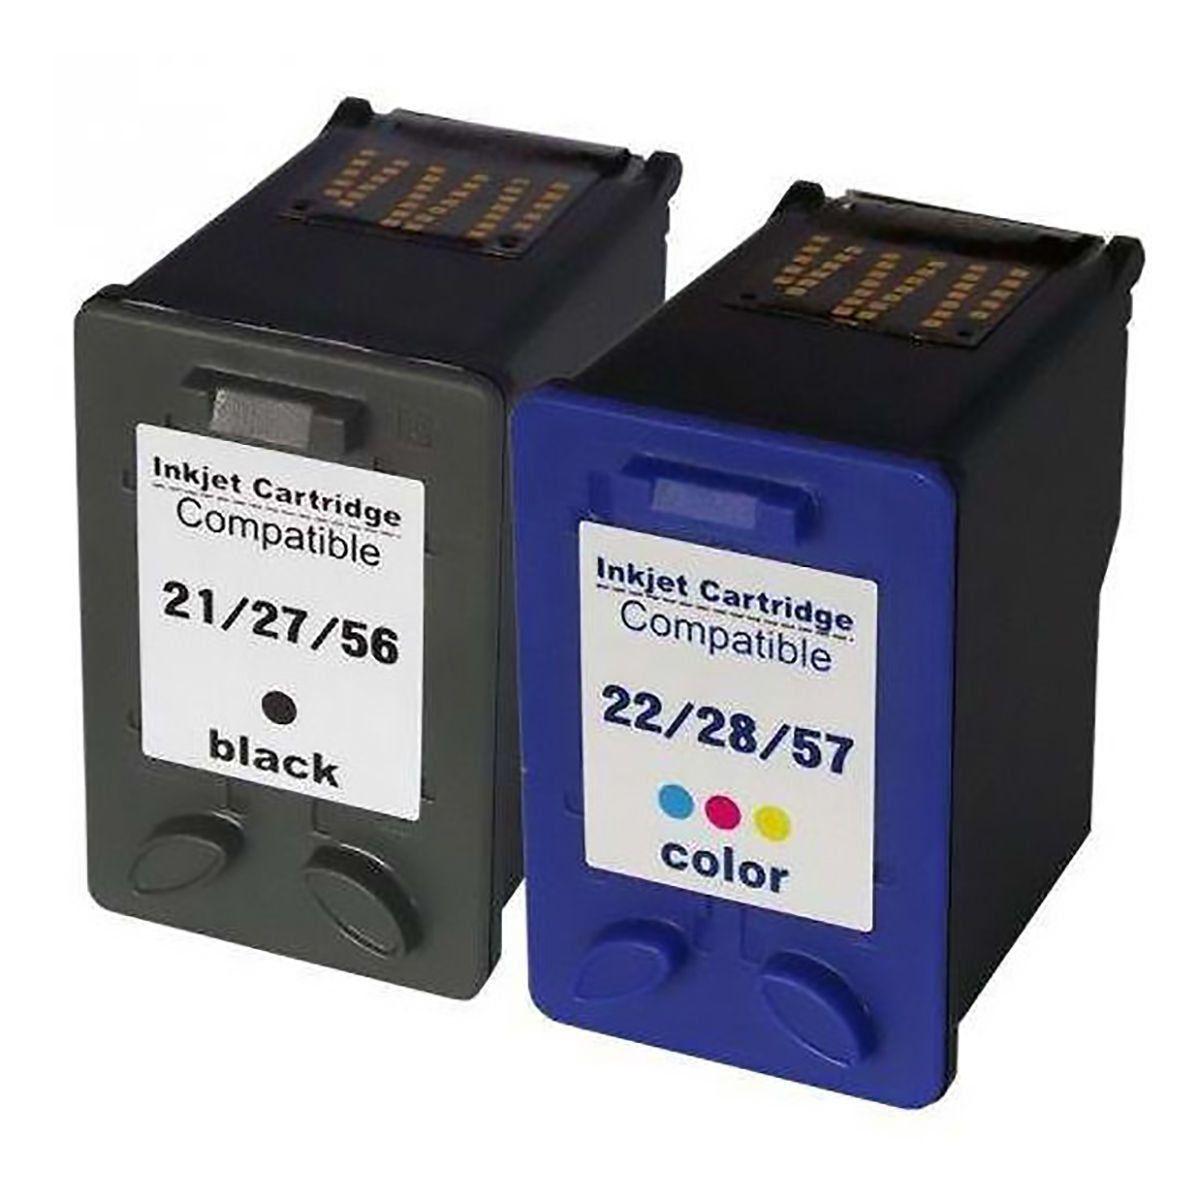 Compatível: Kit Colorido de Cartucho de Tinta 21 27 56 e 22 28 57 para Impressora HP F4180 F380 J3680 D2360 D2460 3910